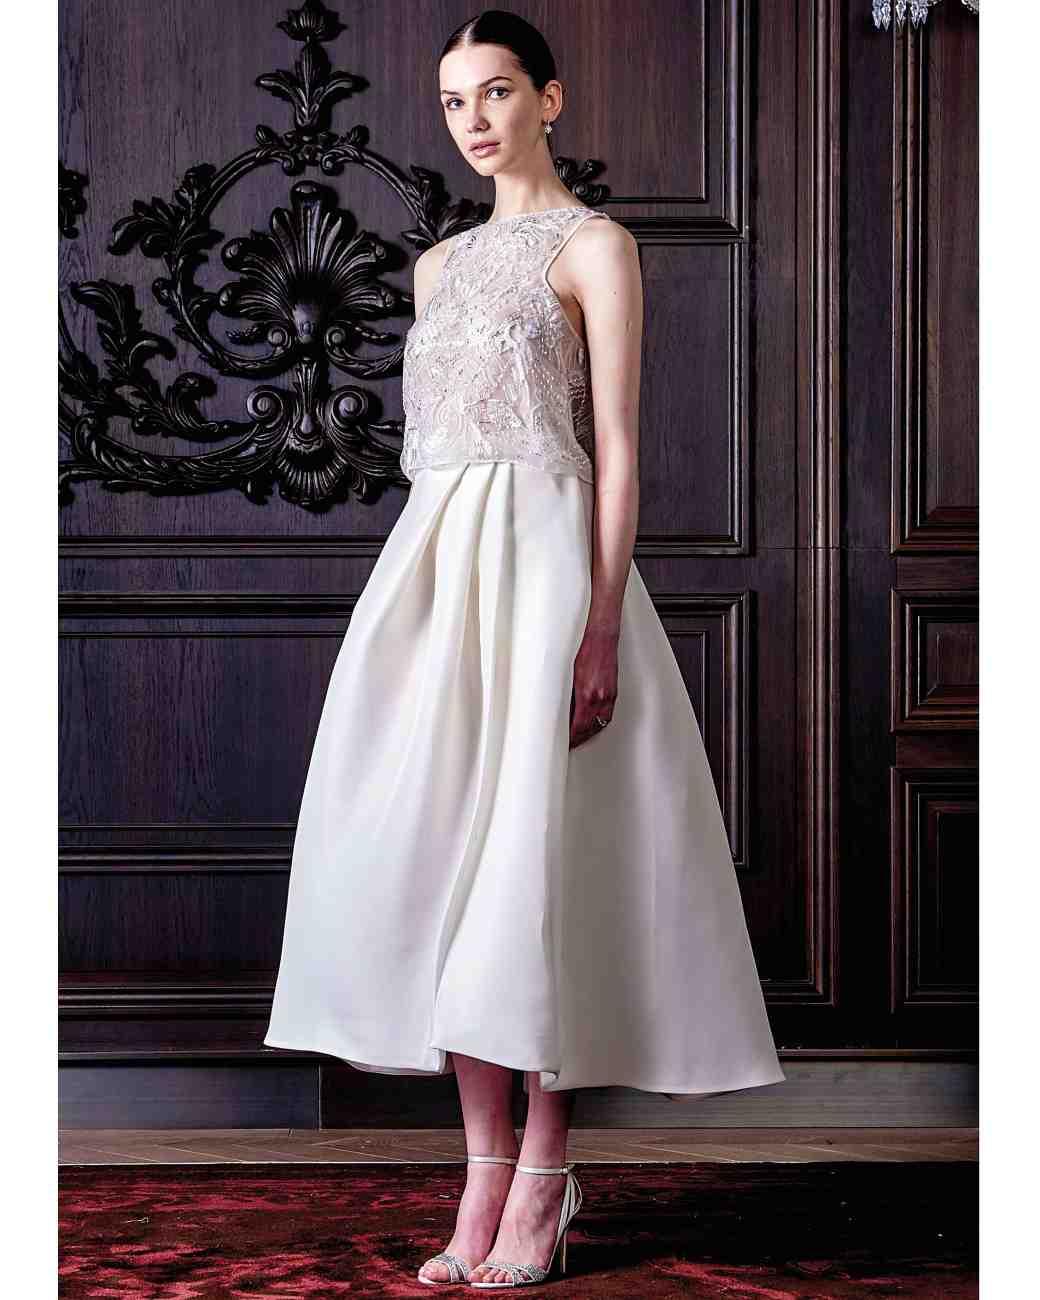 monique lhuillier wedding dress two piece vzzJxom BNn WuTHBrPpMSlgwzClehAnlMGL g 2 piece wedding dresses Gowns Wedding Dresses Monique Lhuillier Two Piece